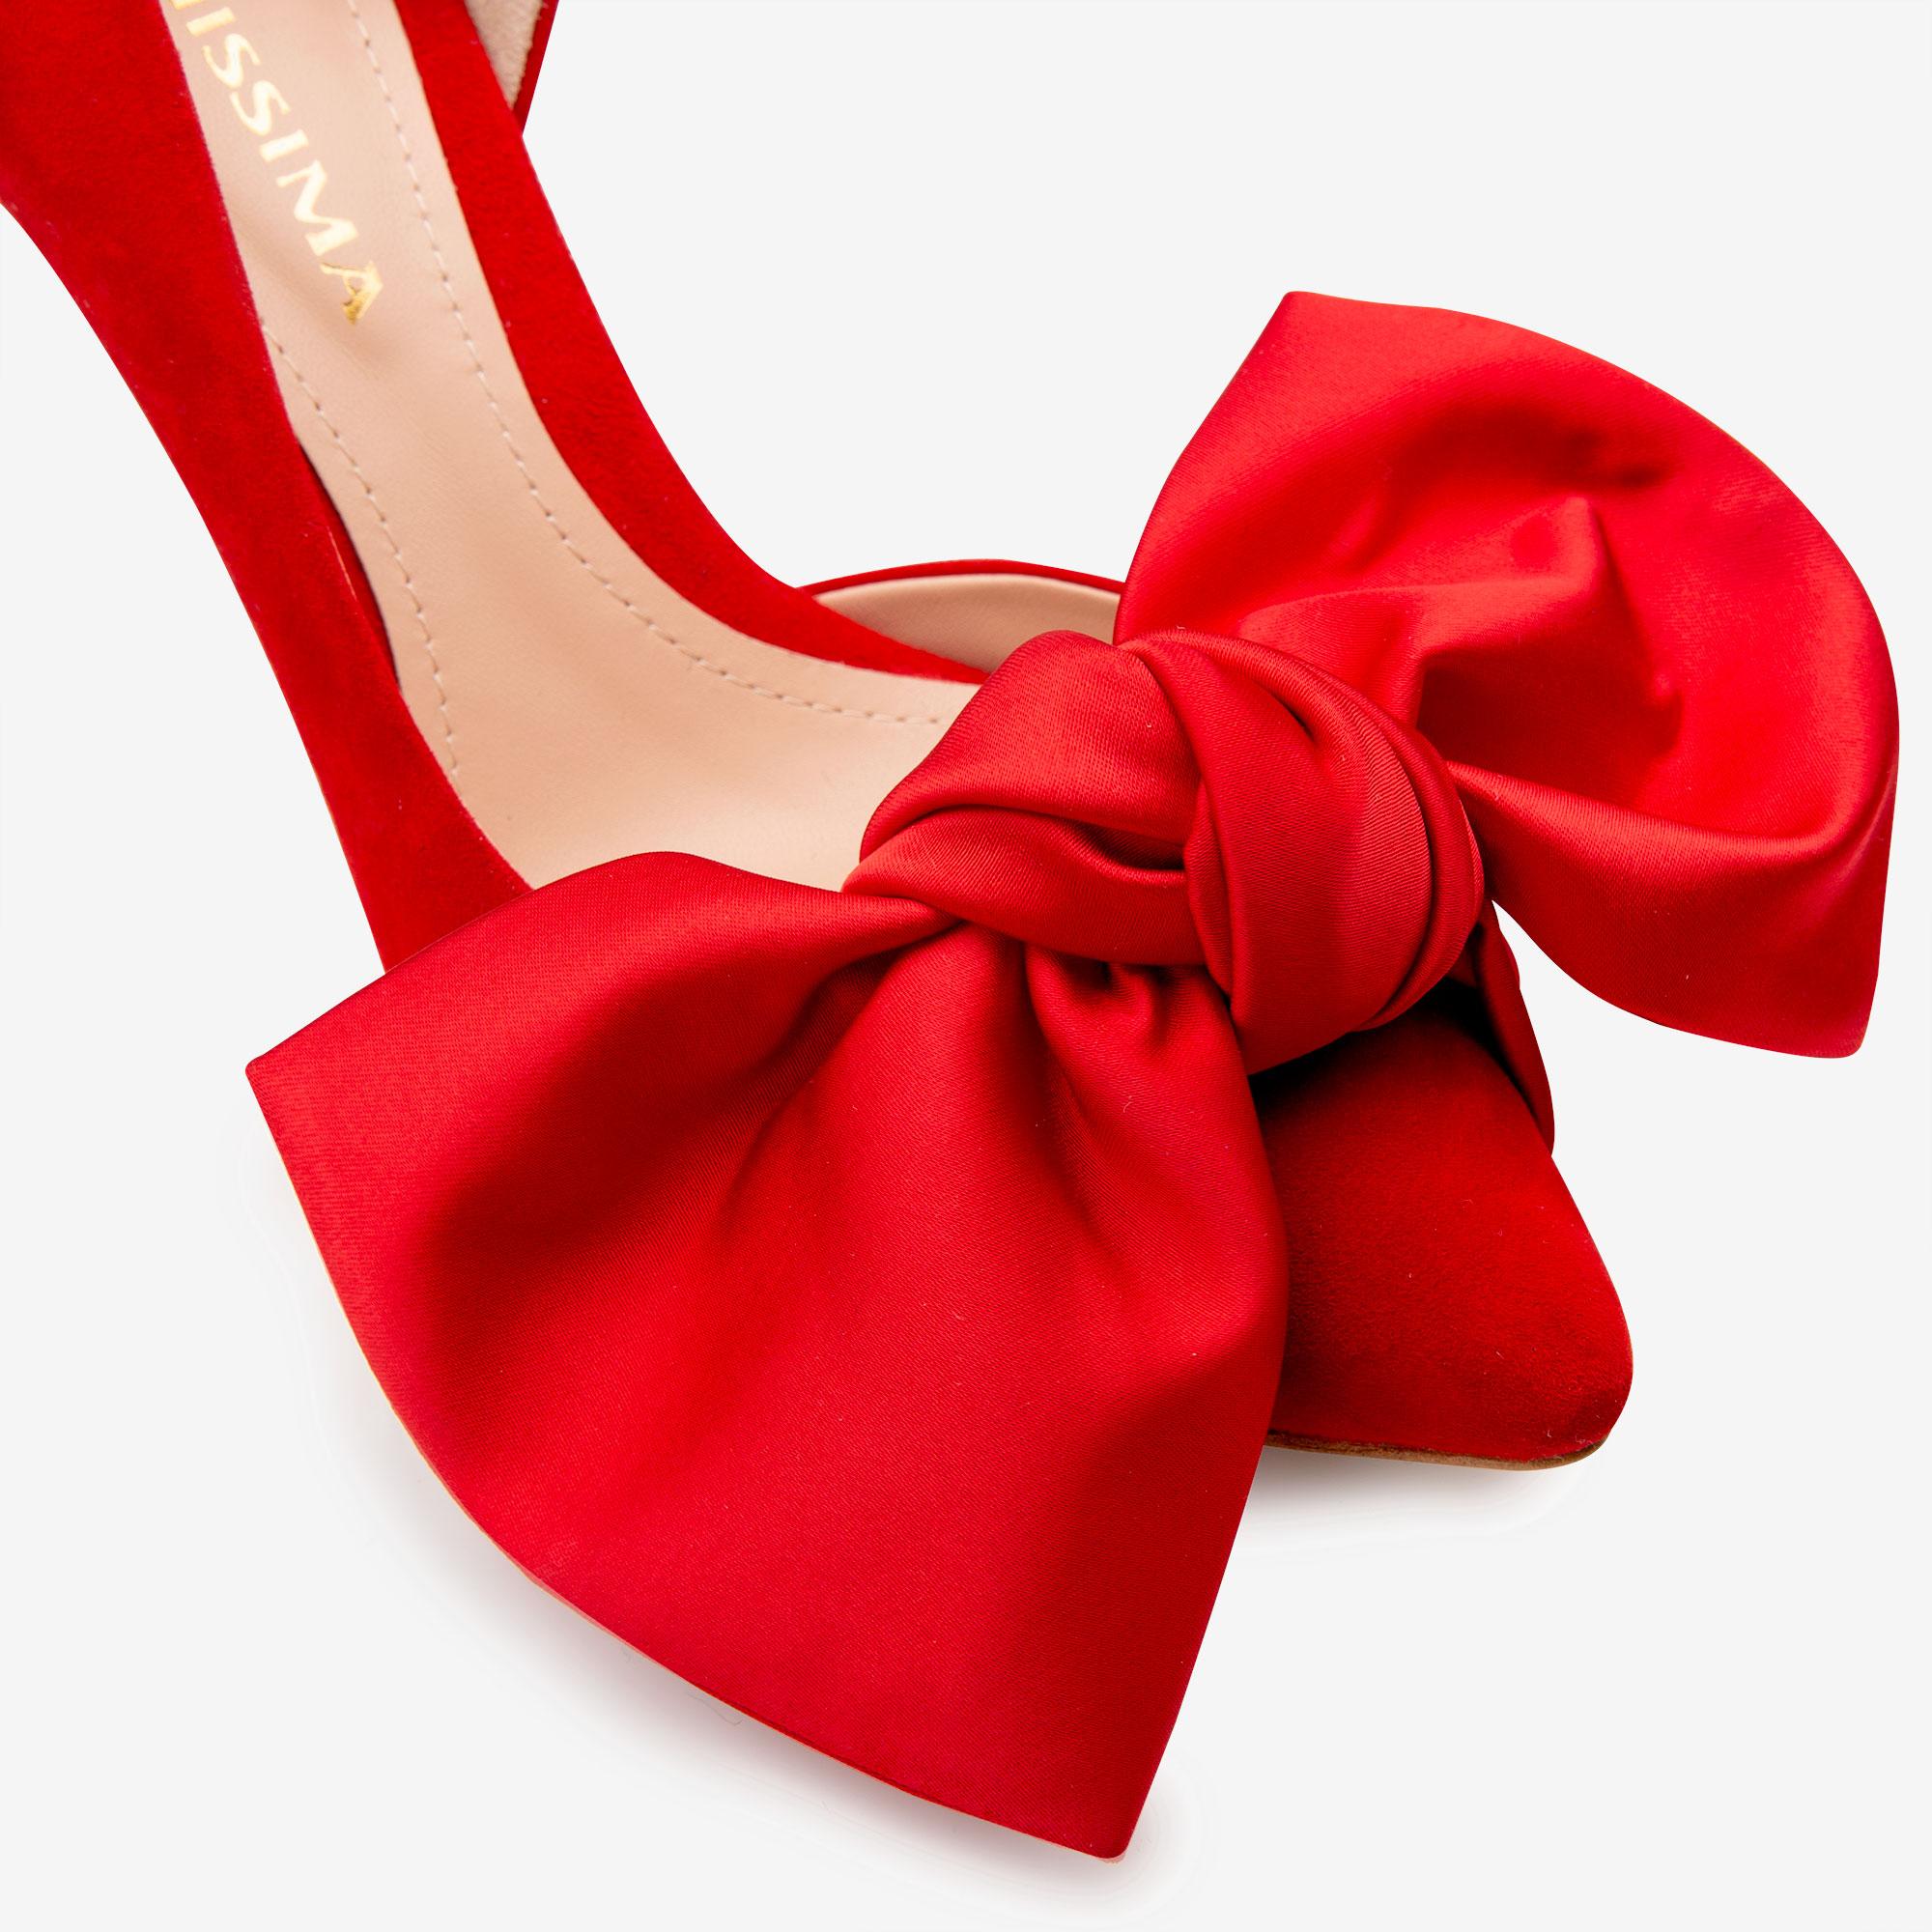 Pantofi din piele intoarsa cu funda rosie supradimensionata Ginissima imagine 4